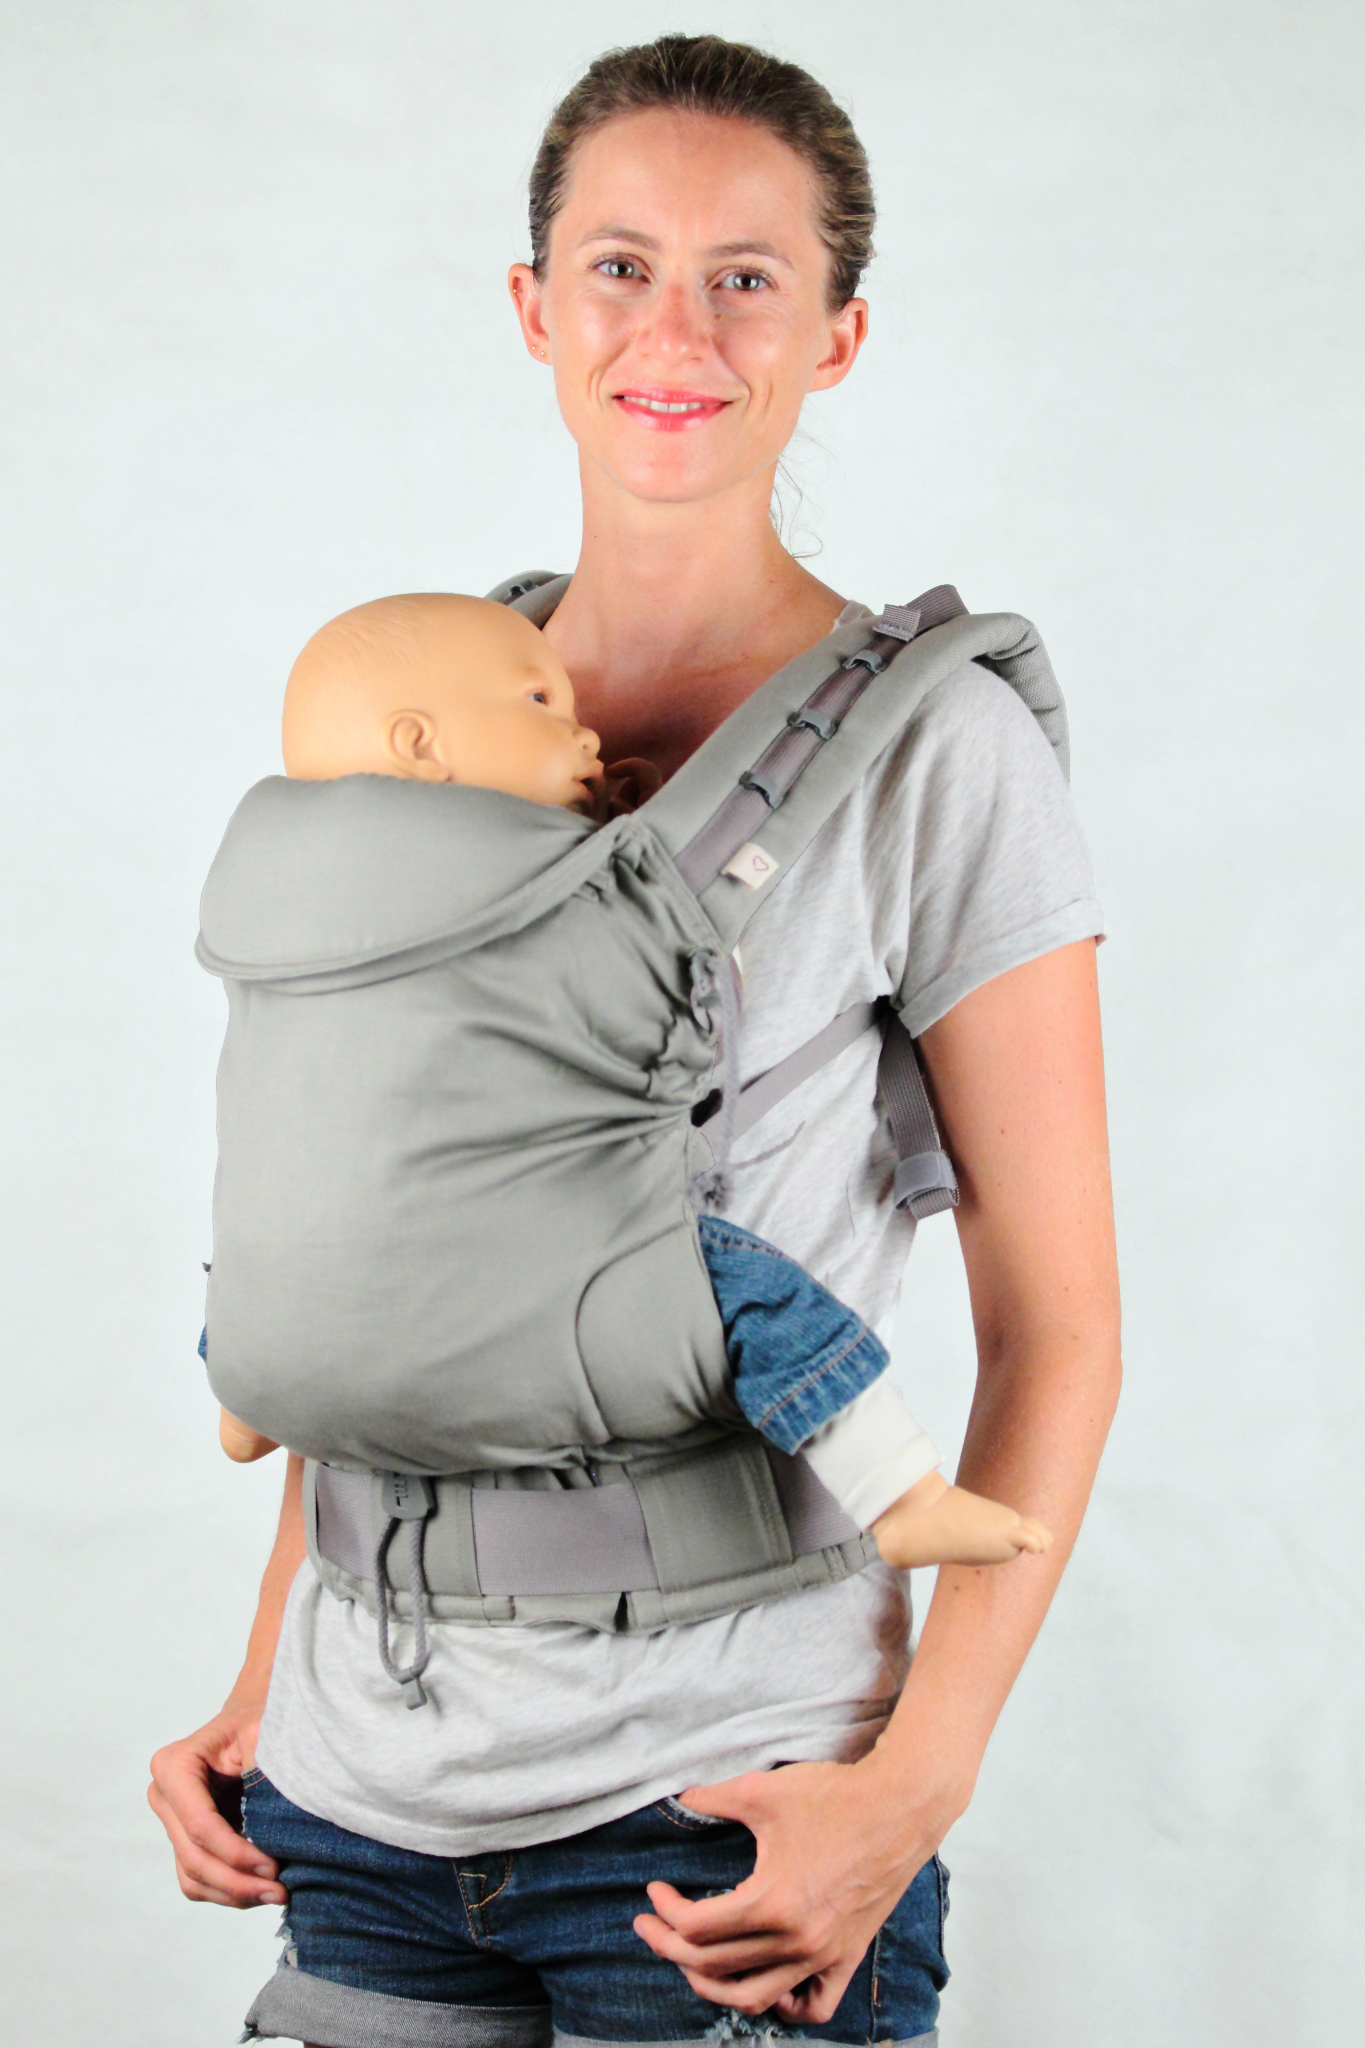 Porte-bébé physiologique   écharpe de portage, sling, Mid-Taï, M-Taï ... 3f37b7622cd